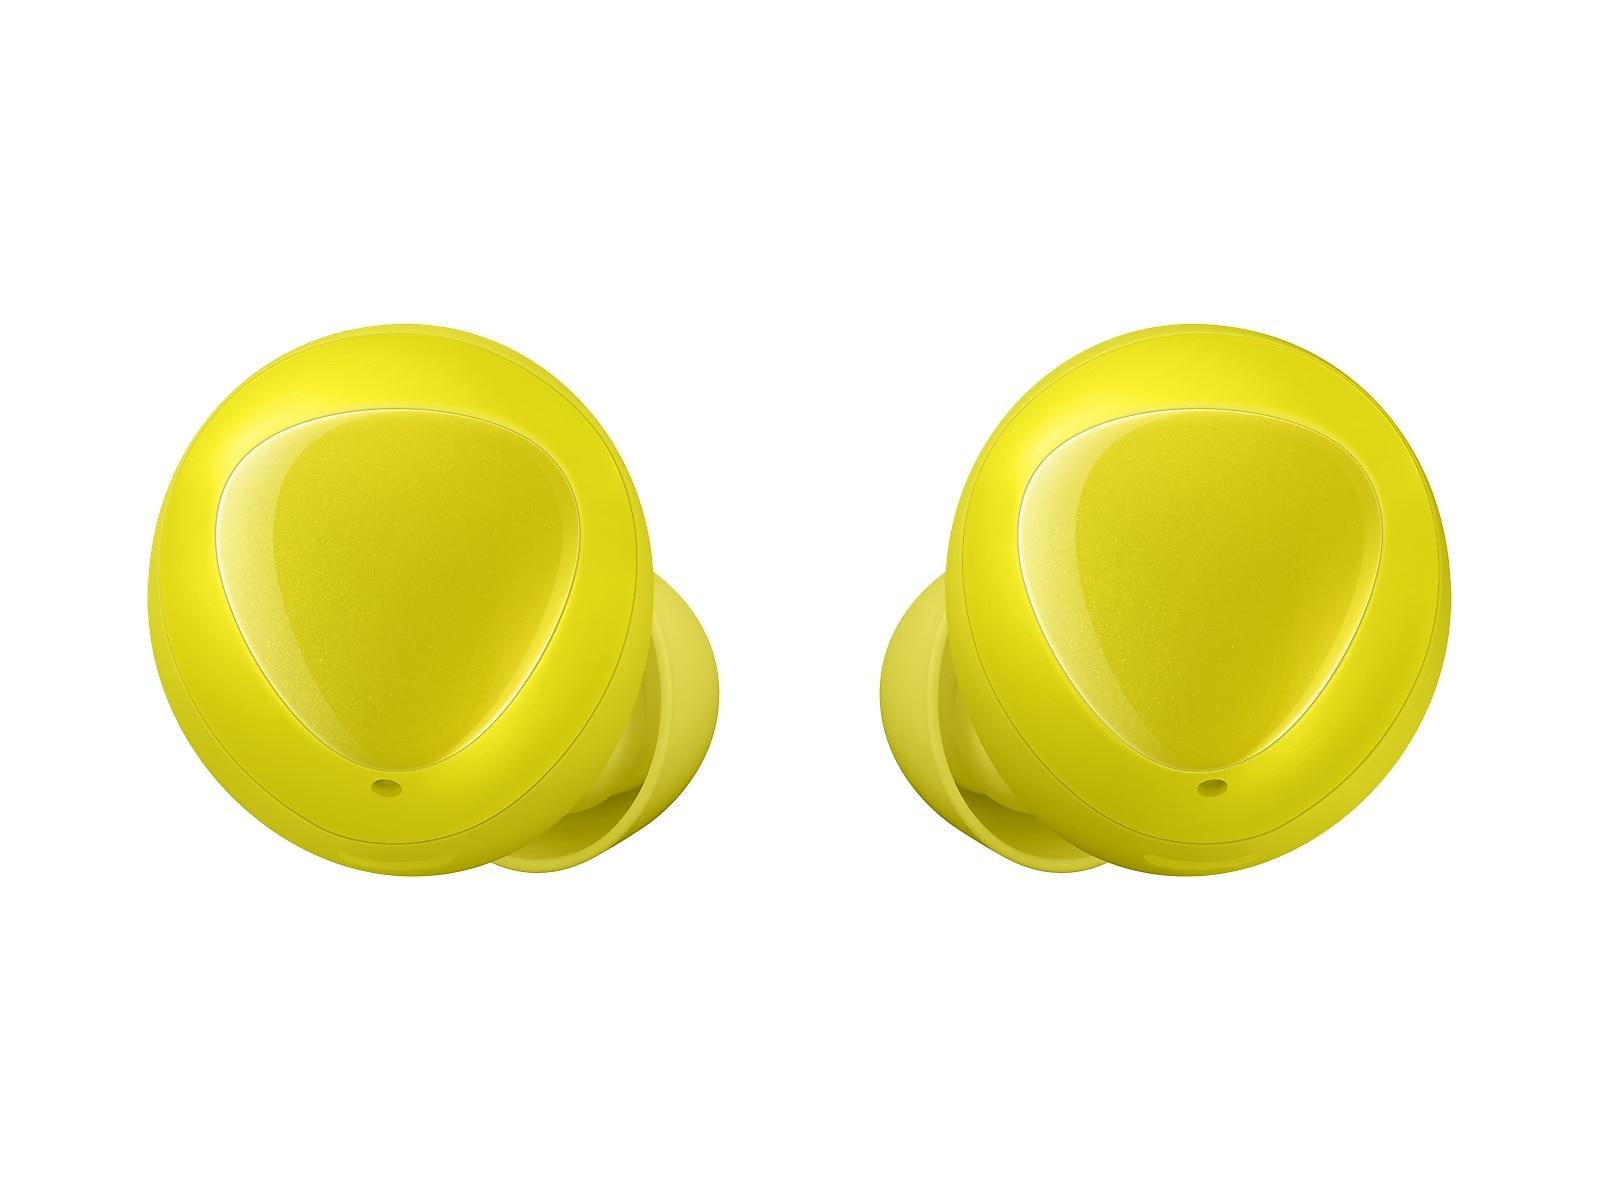 Galaxy Buds Yellow Wireless Charging Case Included Samsung Us Samsung Us Samsung Samsung Galaxy Wireless Earbuds